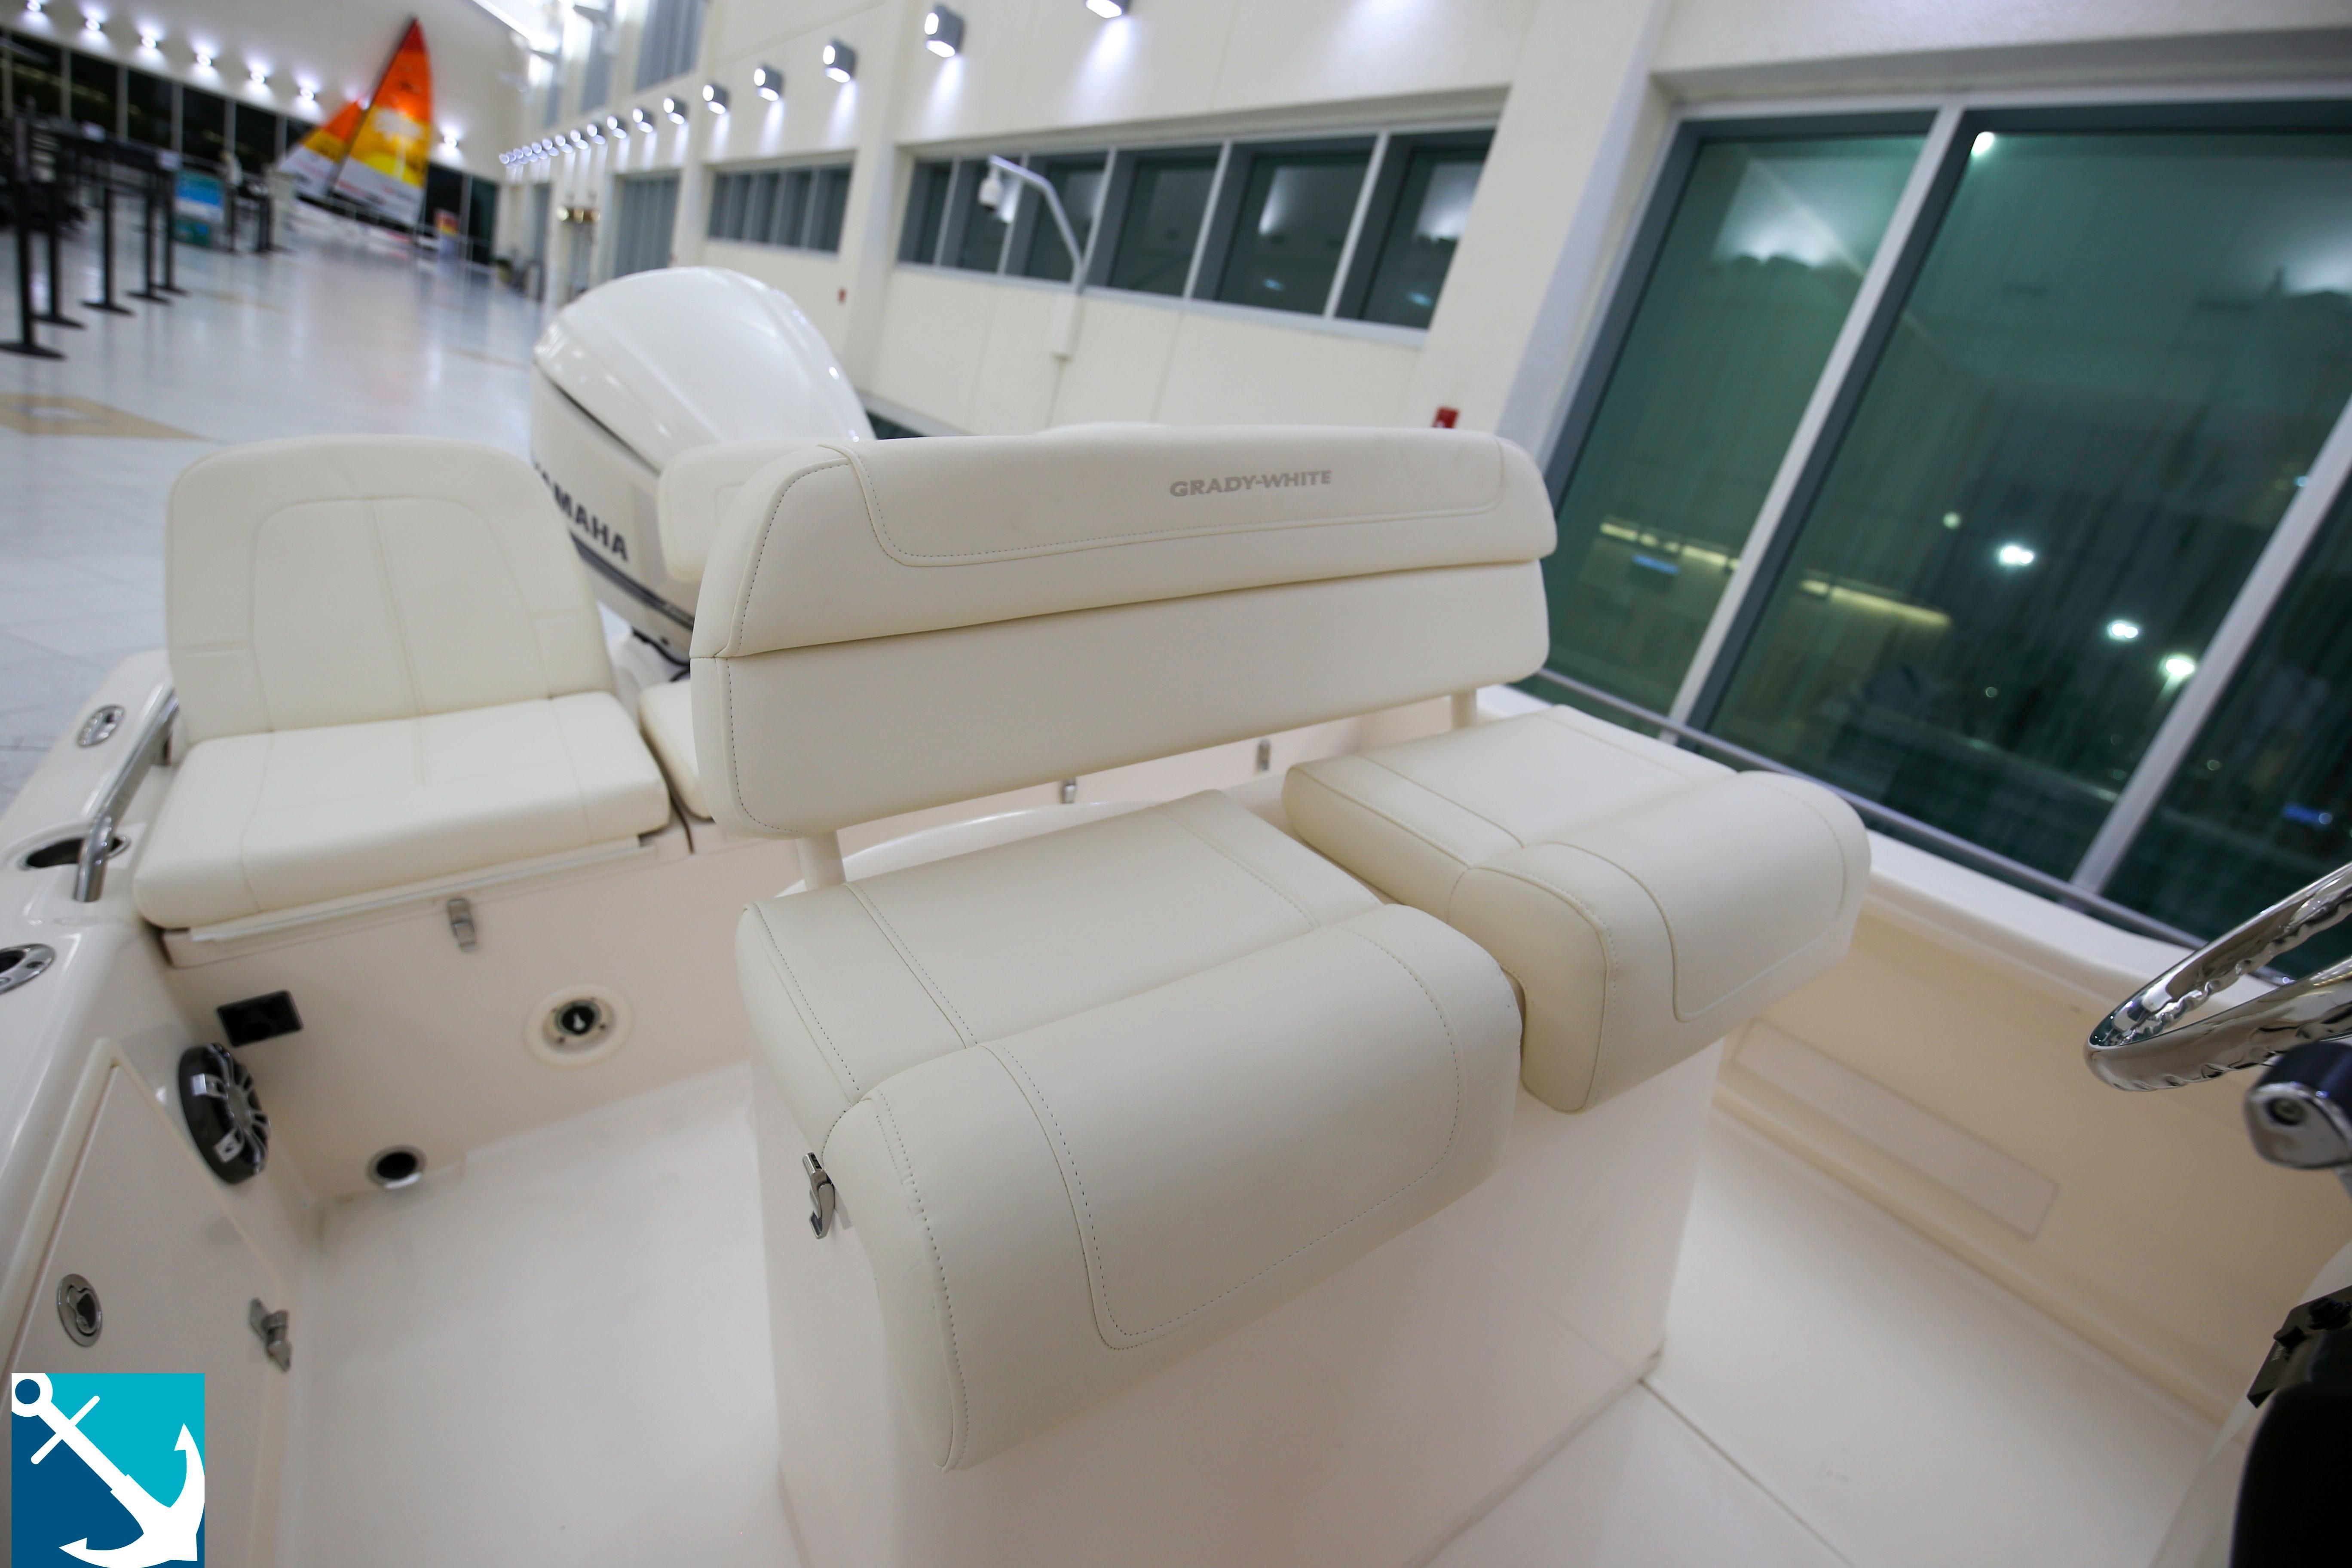 Grady-White 251 Coastal Explorer 2020 7